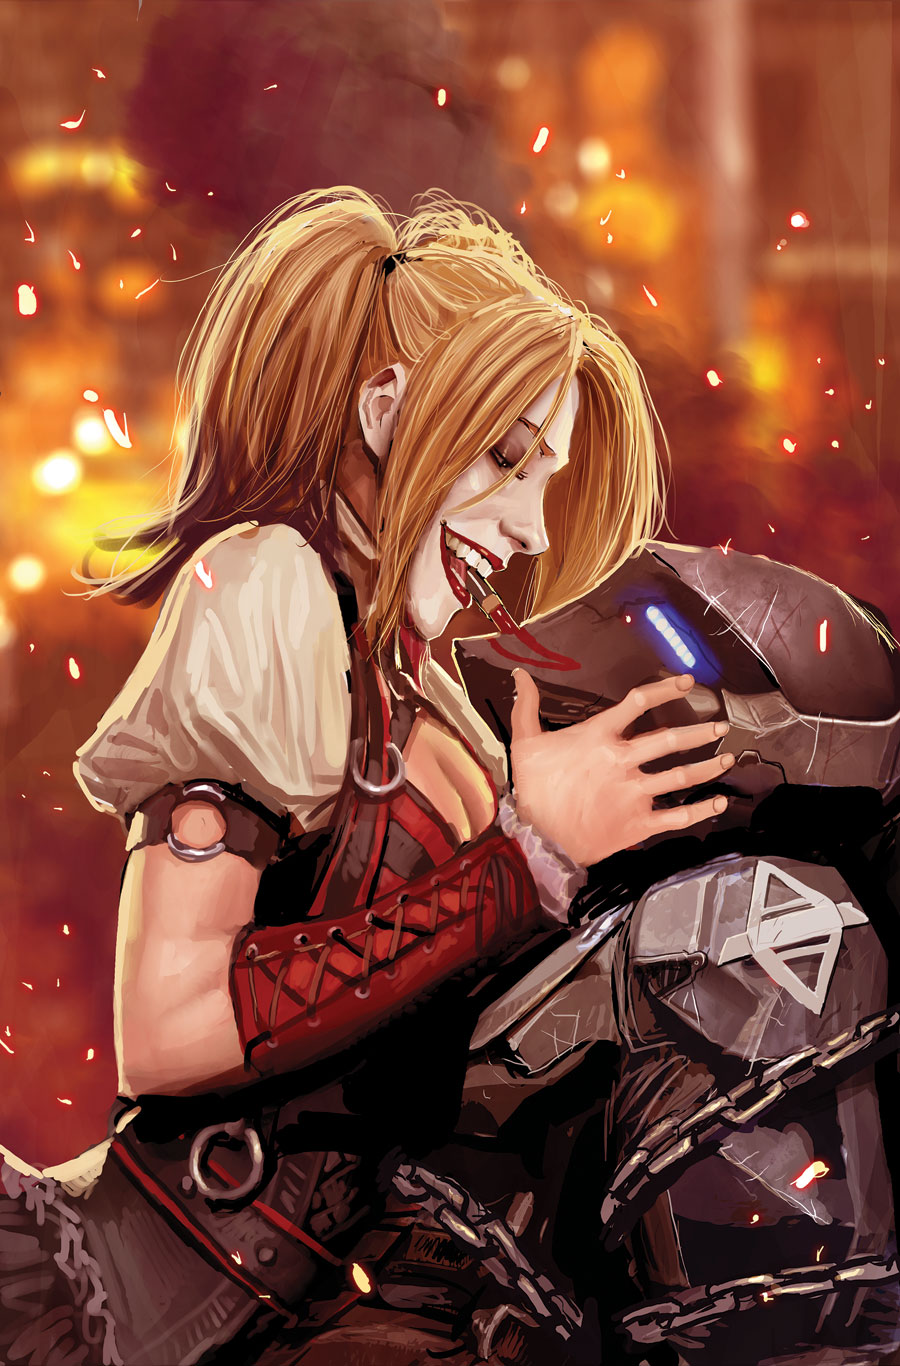 1girl arkham_knight armor batman:_arkham batman_(series) breasts chains cleavage dc_comics gradient gradient_background harley_quinn jason_todd lipstick makeup power_armor smile twintails